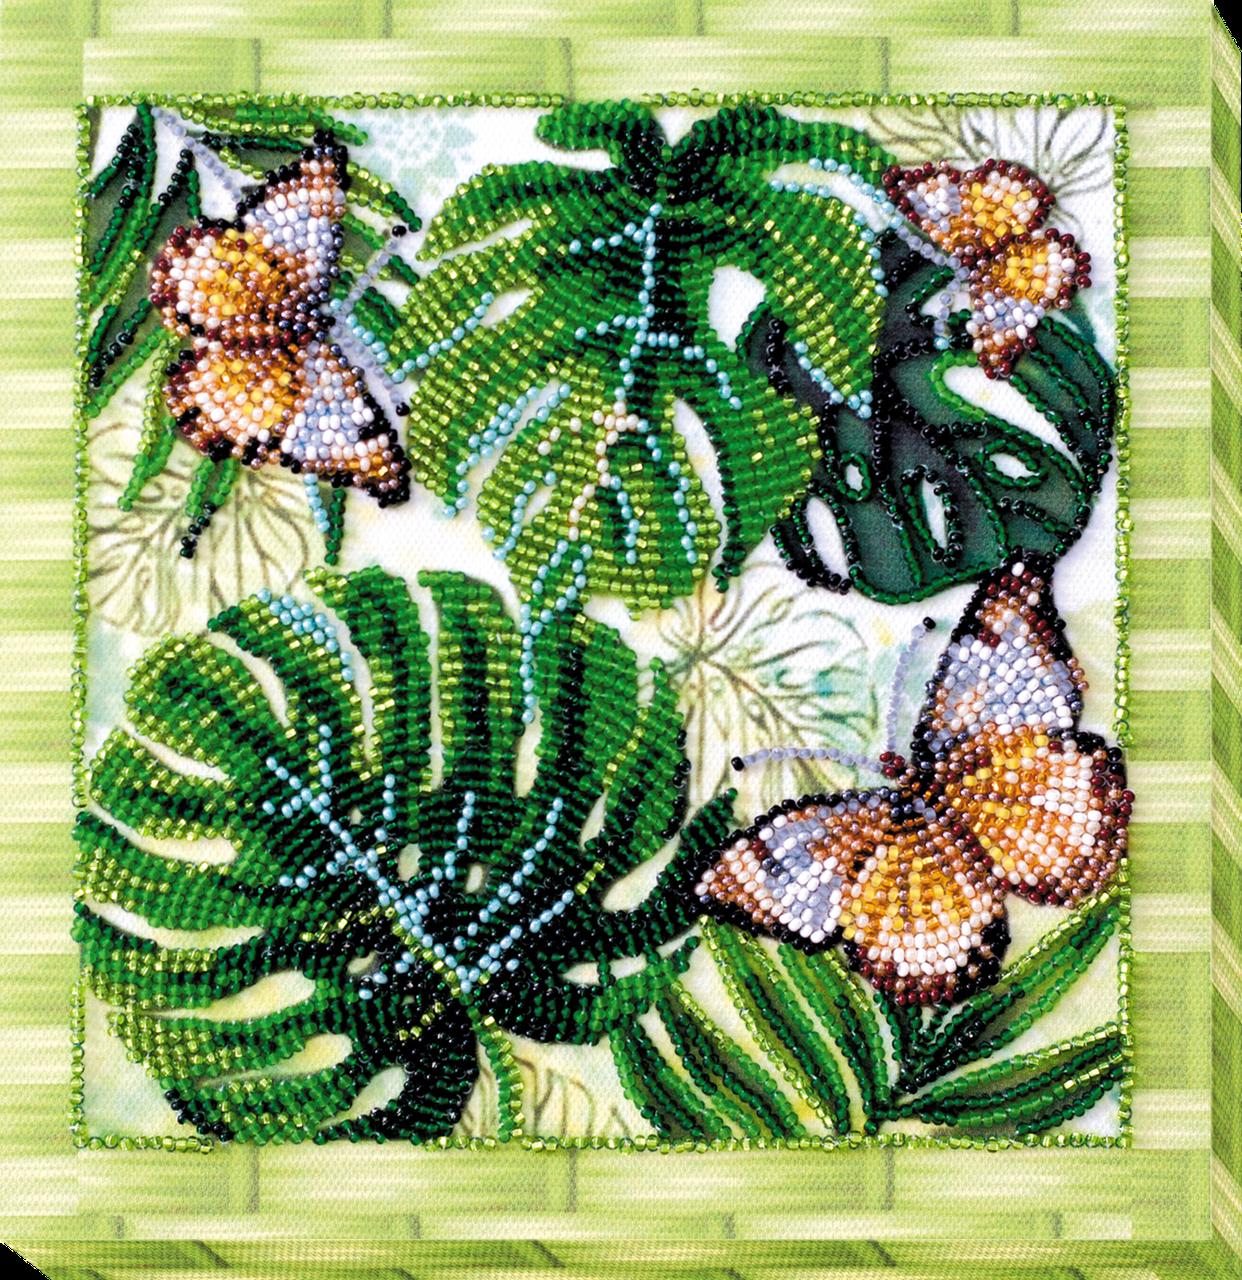 Набор-миди для вышивки бисером Монстера (20 х 20 см) Абрис Арт AMB-028